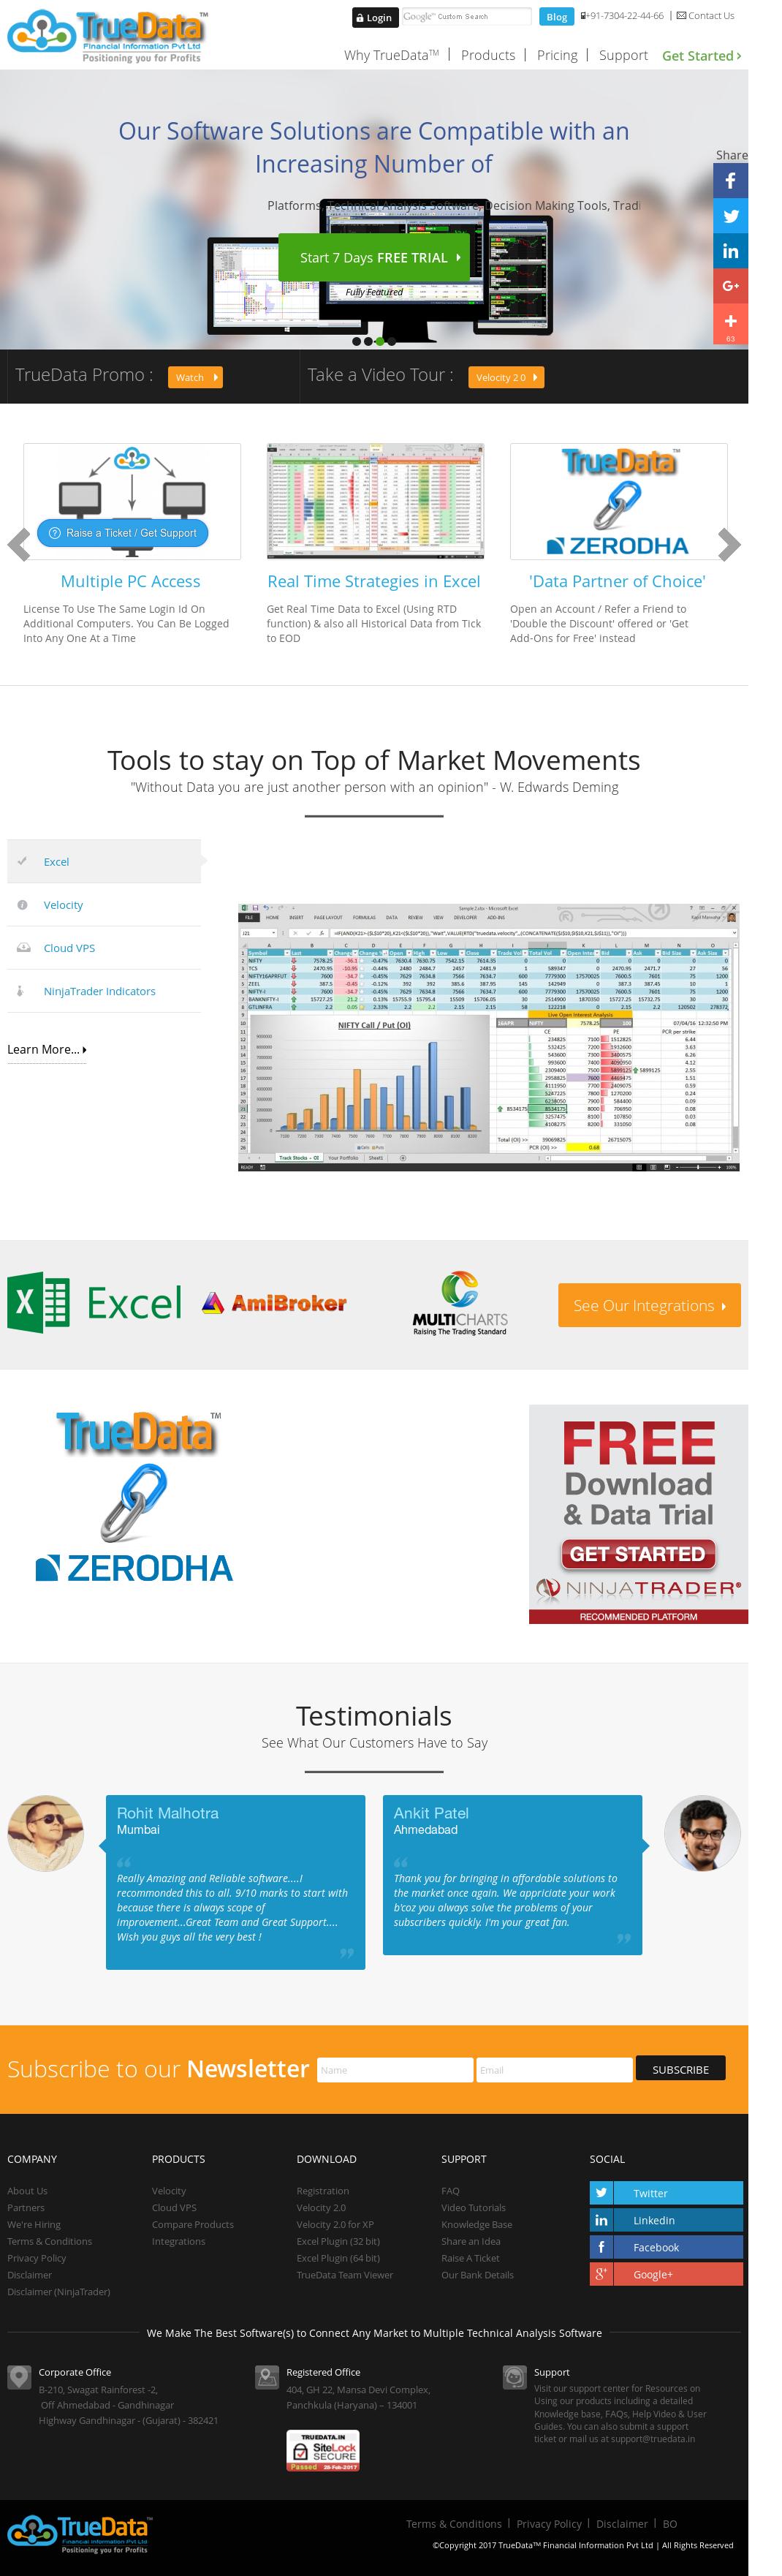 TrueData Competitors, Revenue and Employees - Owler Company Profile